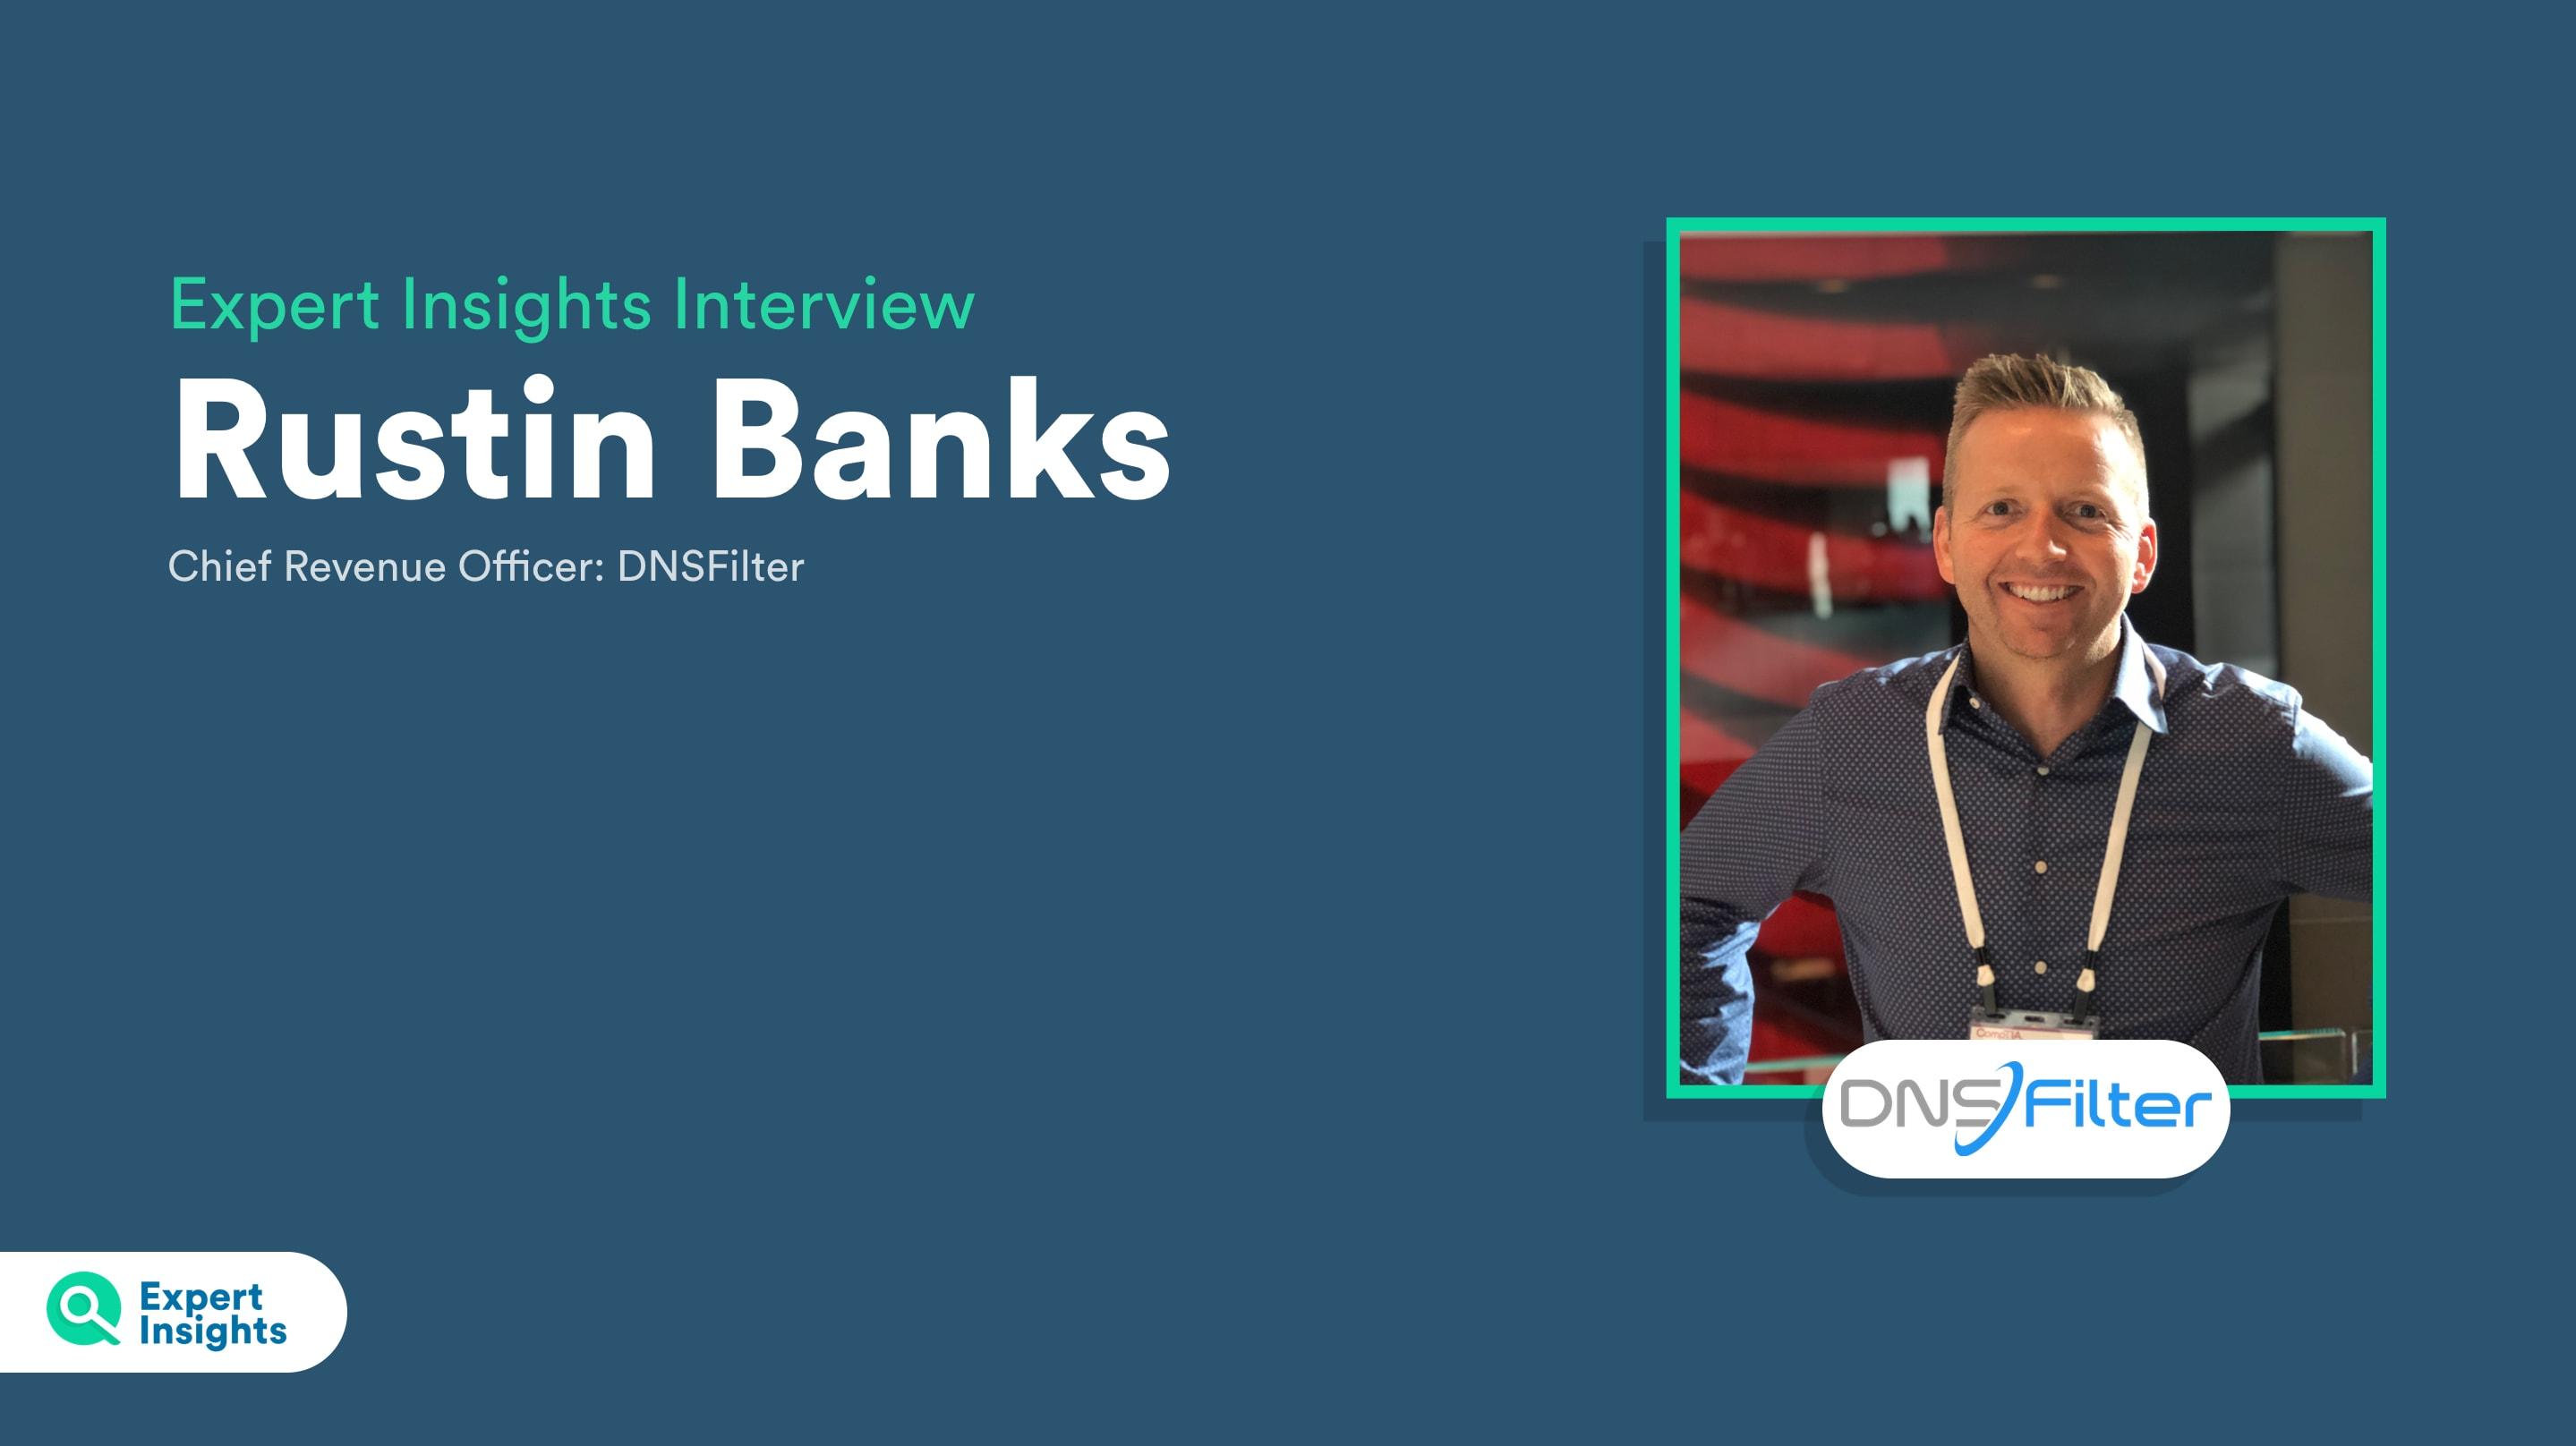 Rustin Banks - DNSFilter